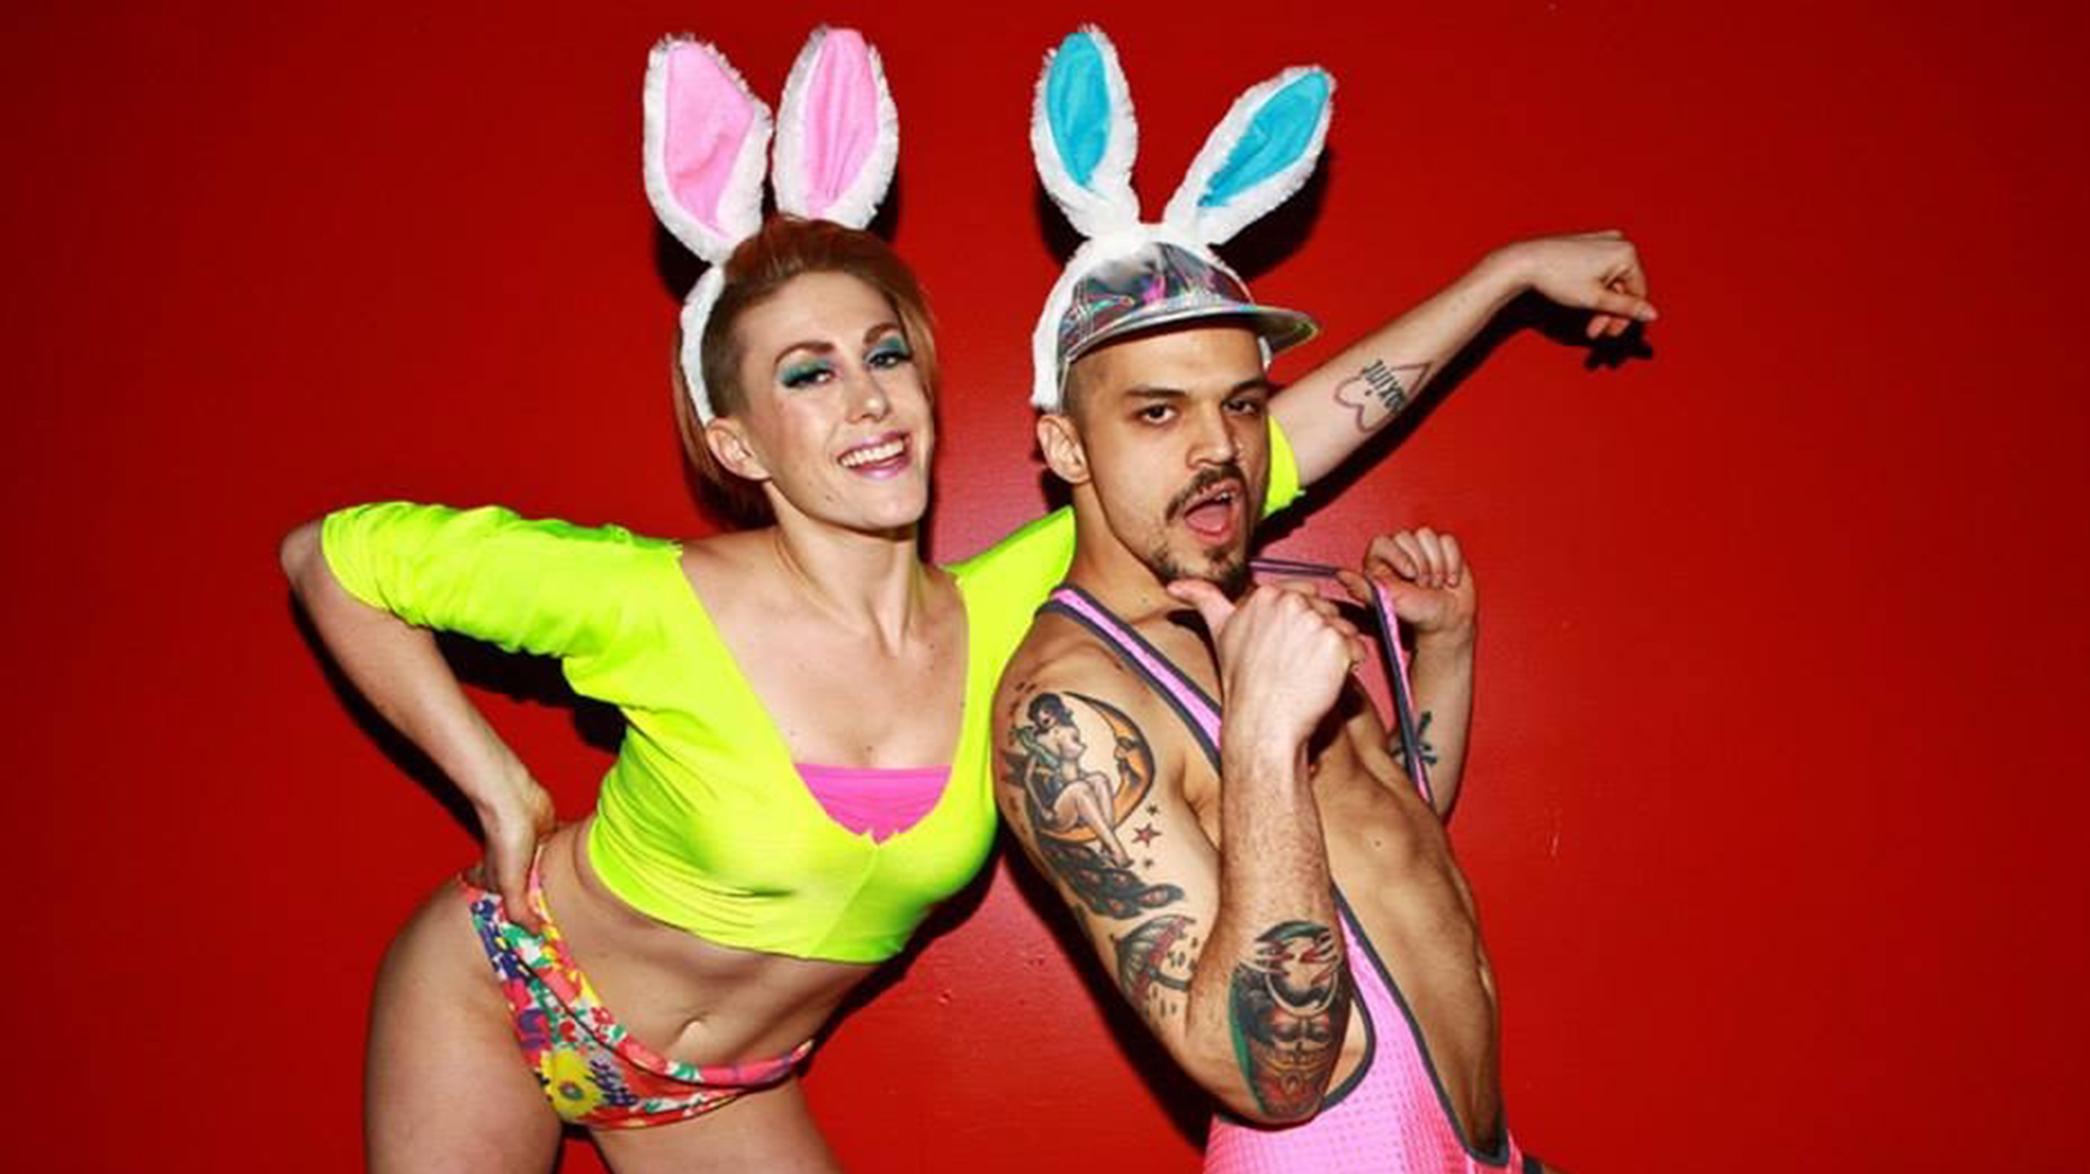 Hot Rabbit LGBTQ Dance Party